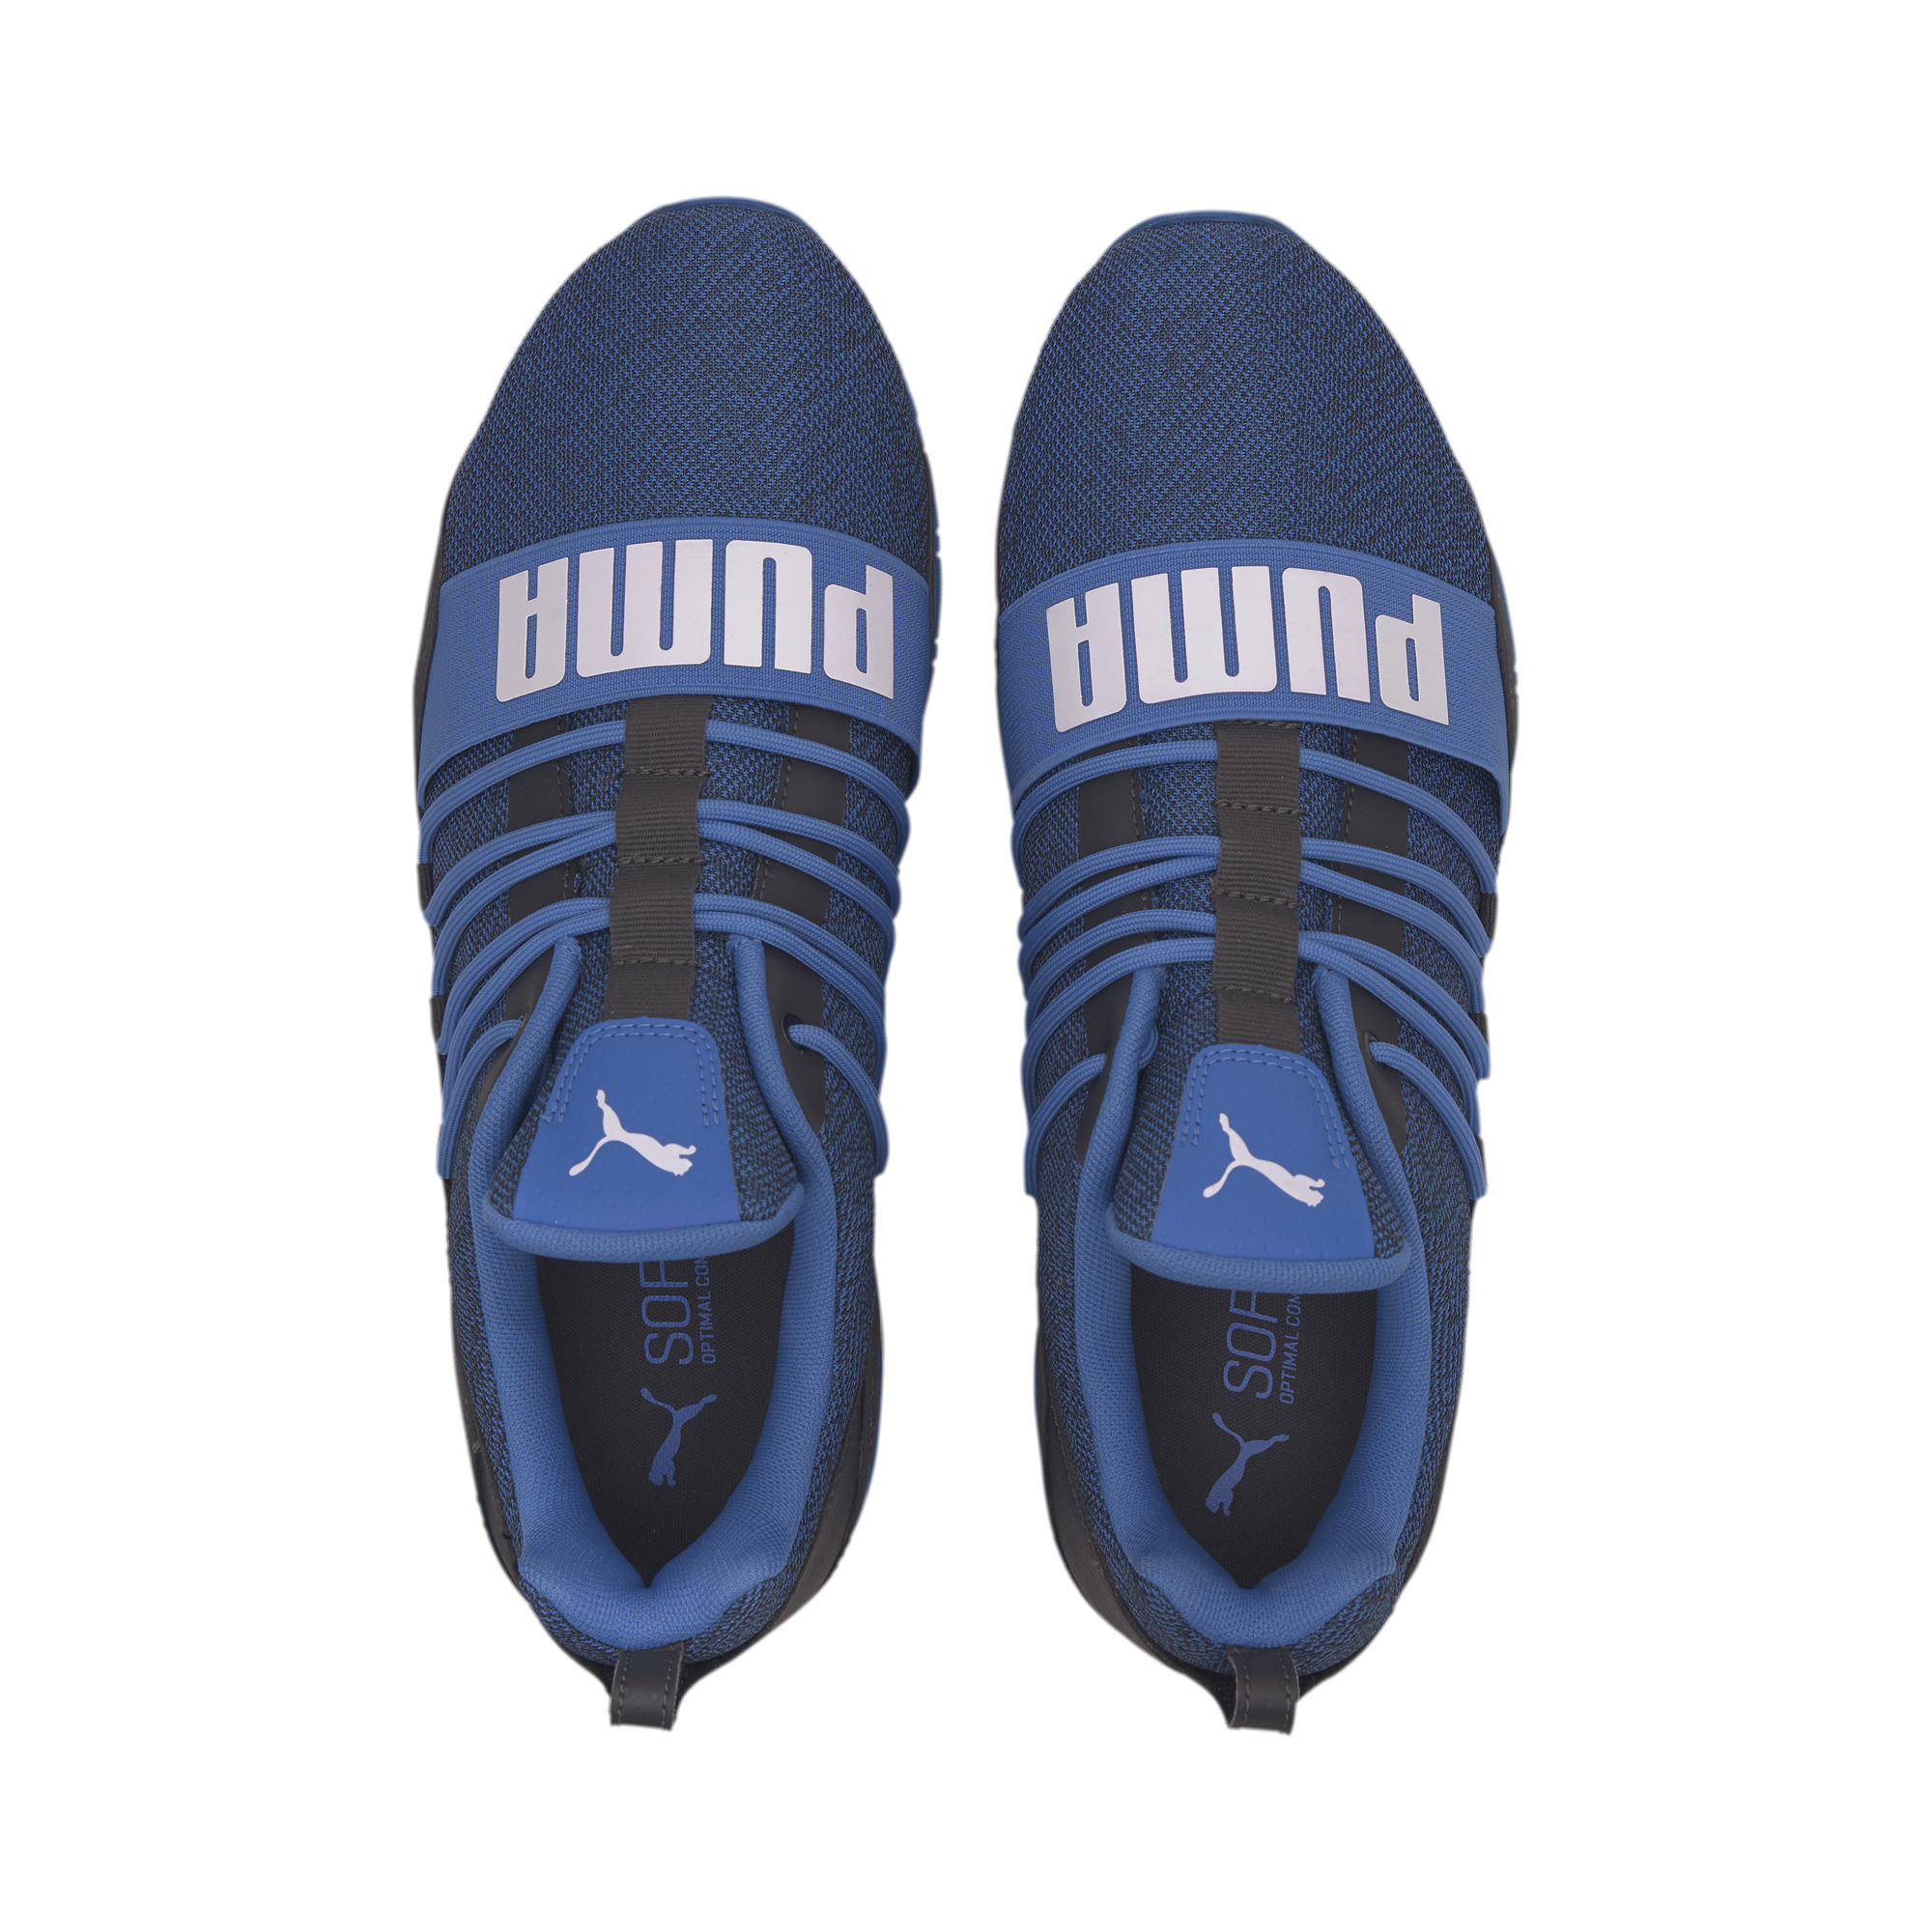 PUMA-Men-039-s-CELL-Regulate-Bold-Training-Shoes thumbnail 15